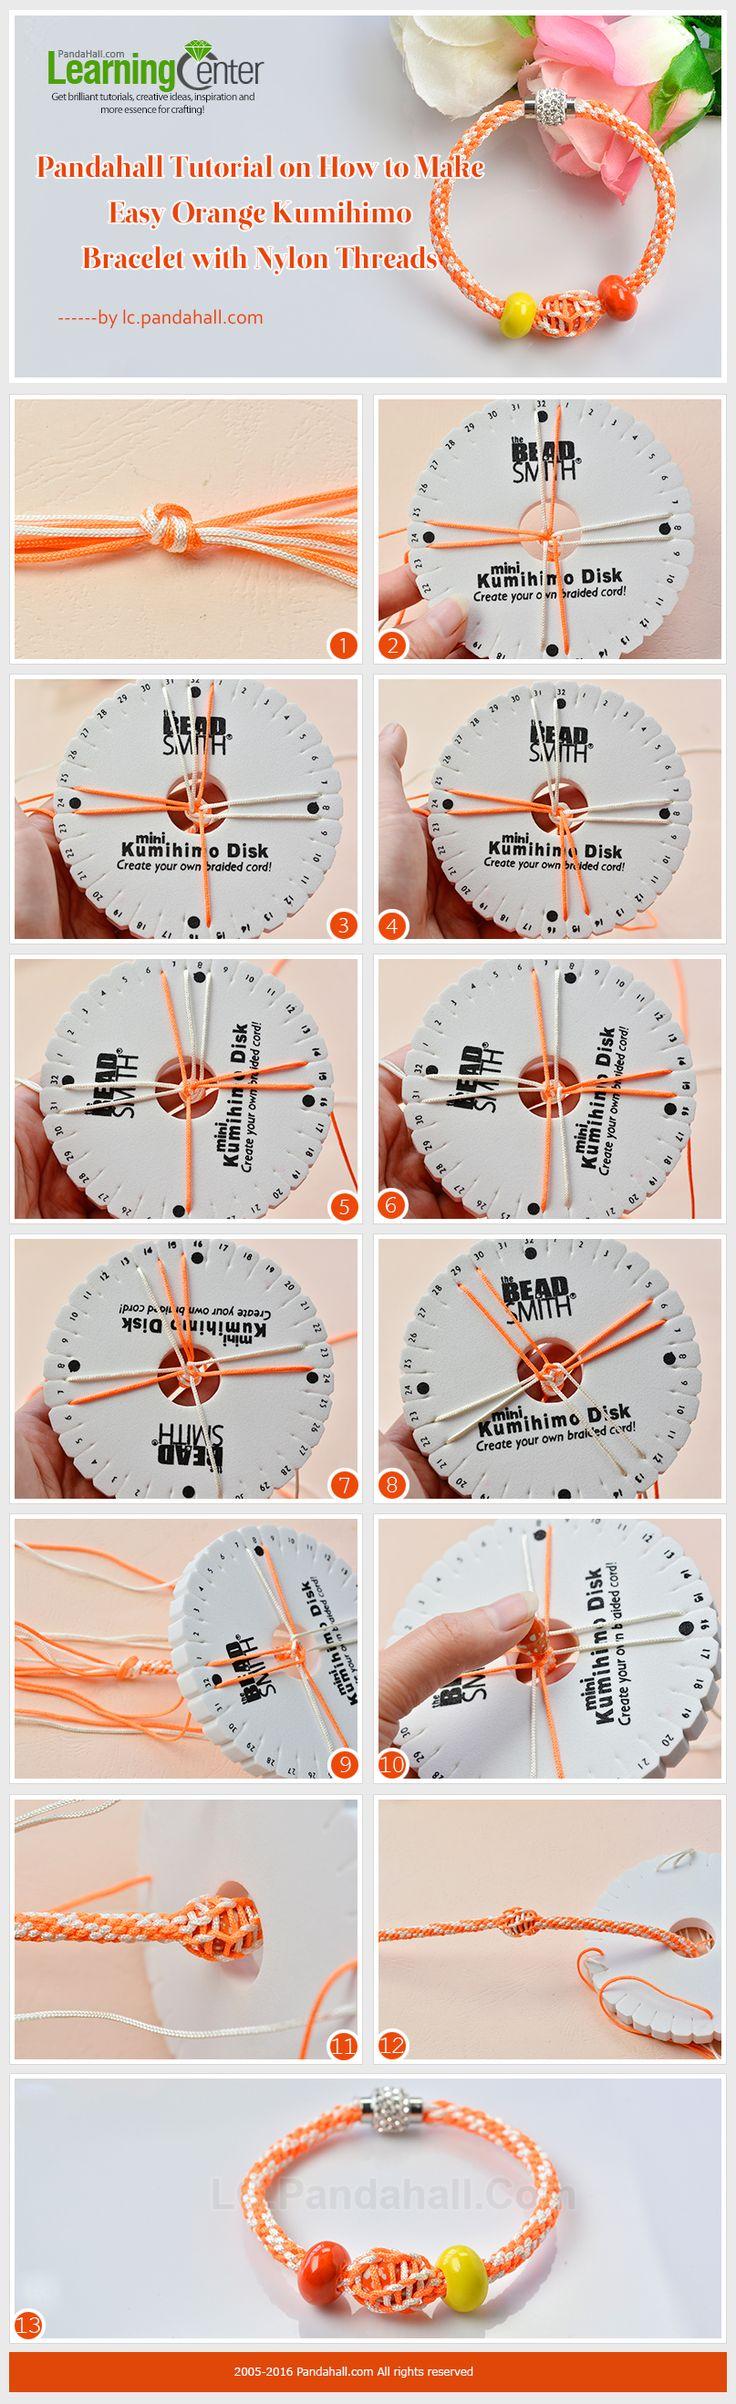 Pandahall Tutorial on How to Make Easy Orange Kumihimo Bracelet with Nylon…